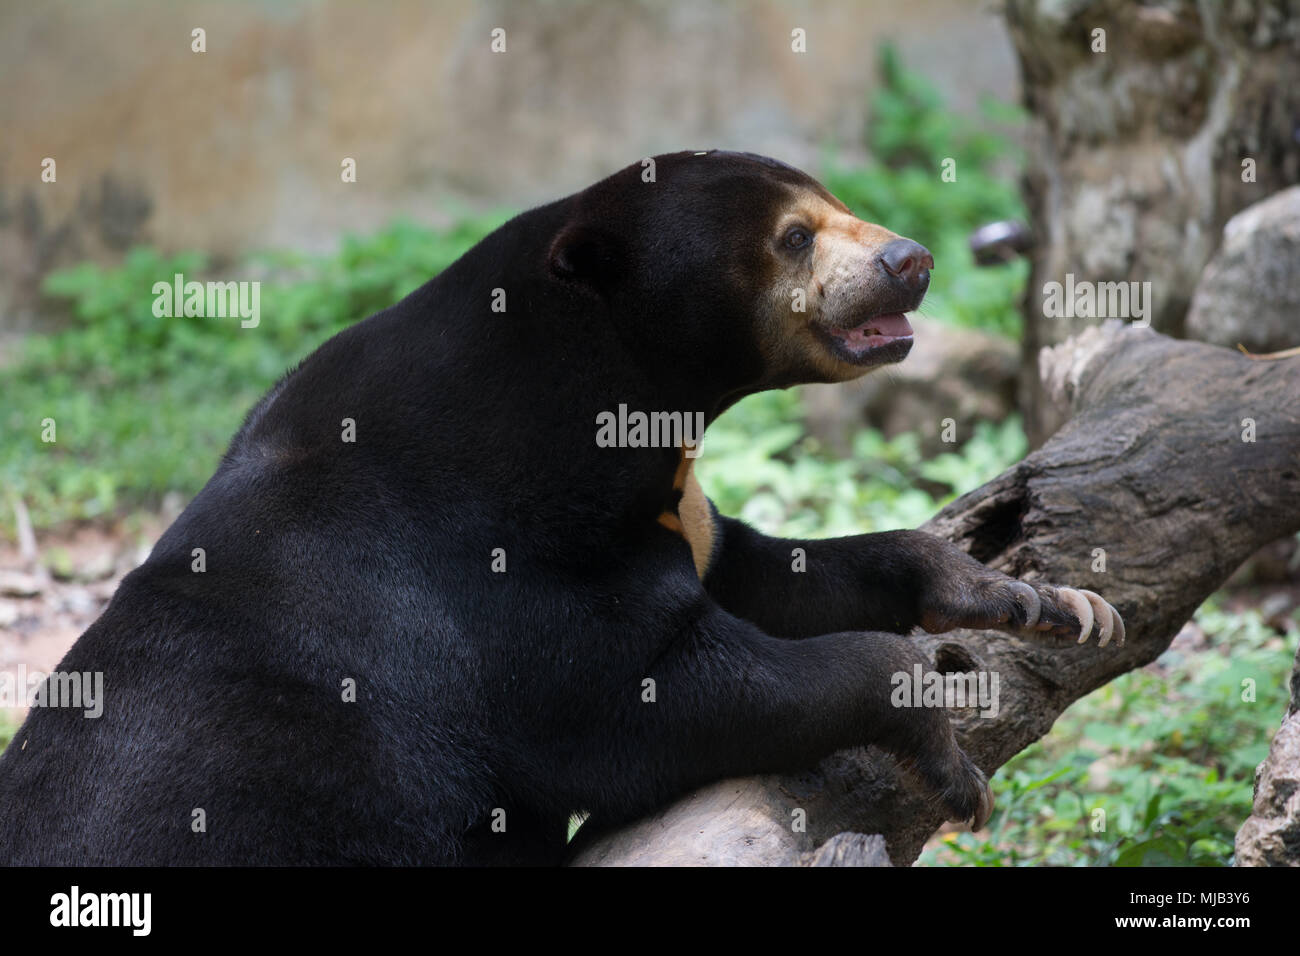 An asia black bear - Stock Image